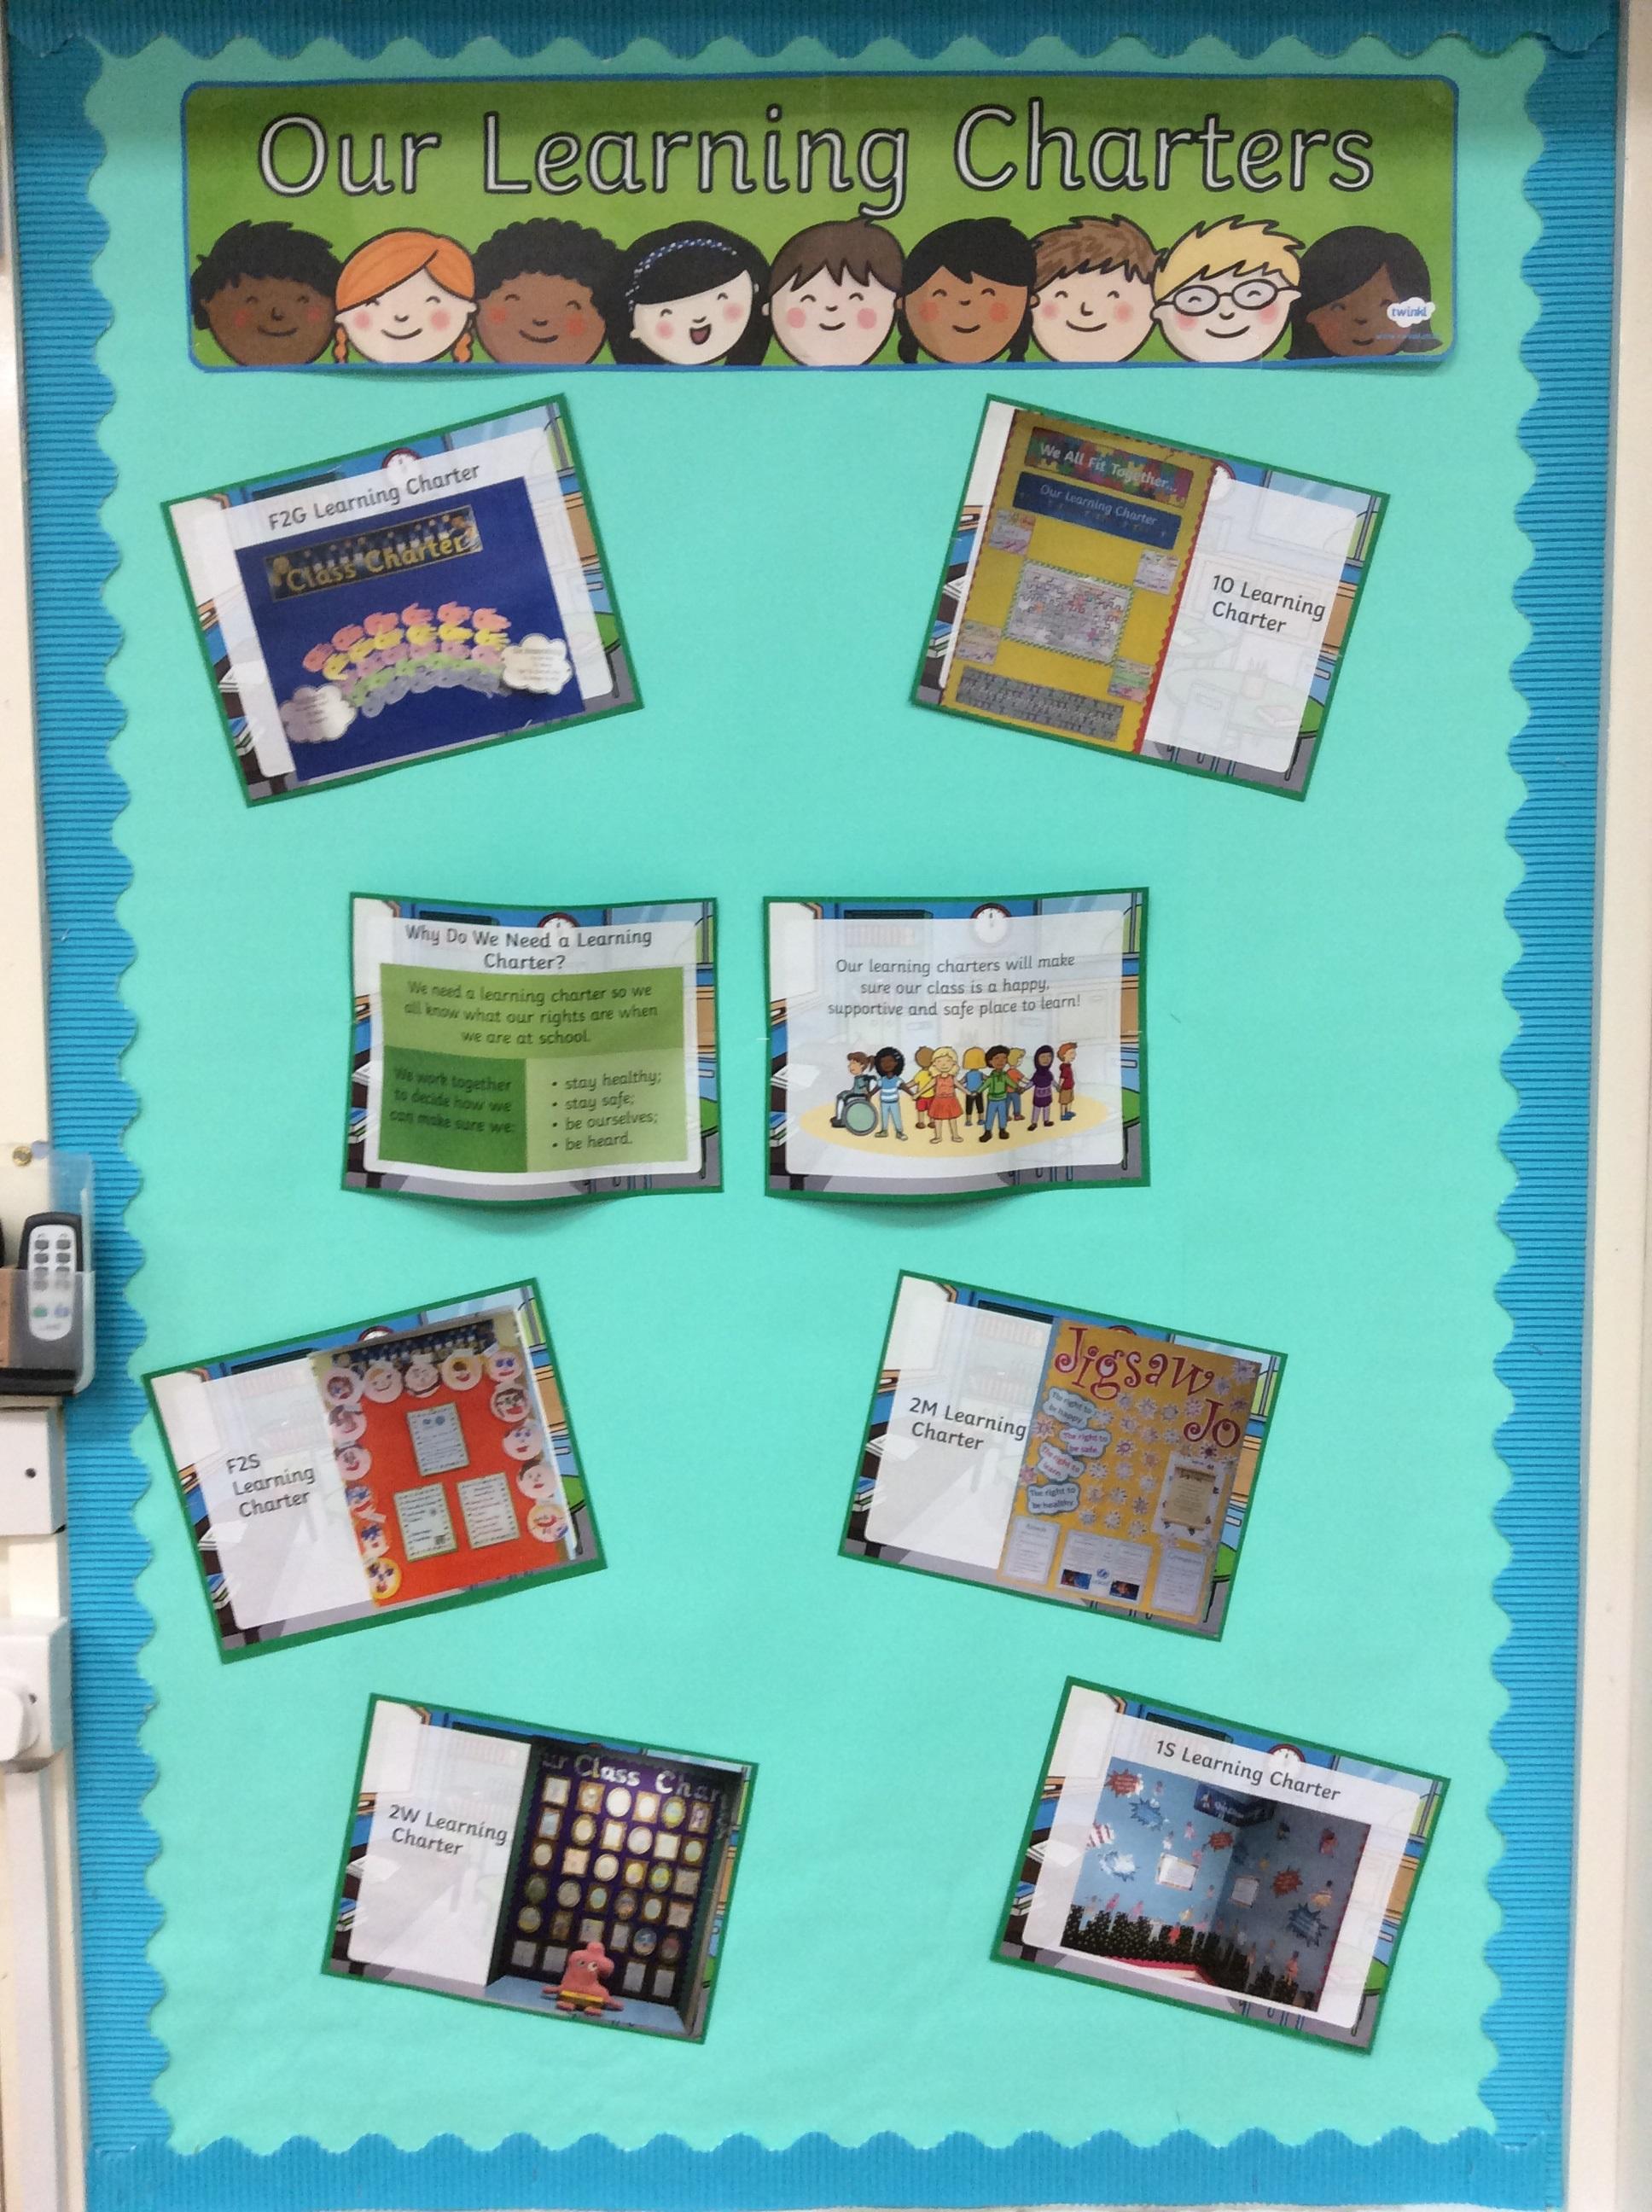 Learning Charters.jpg